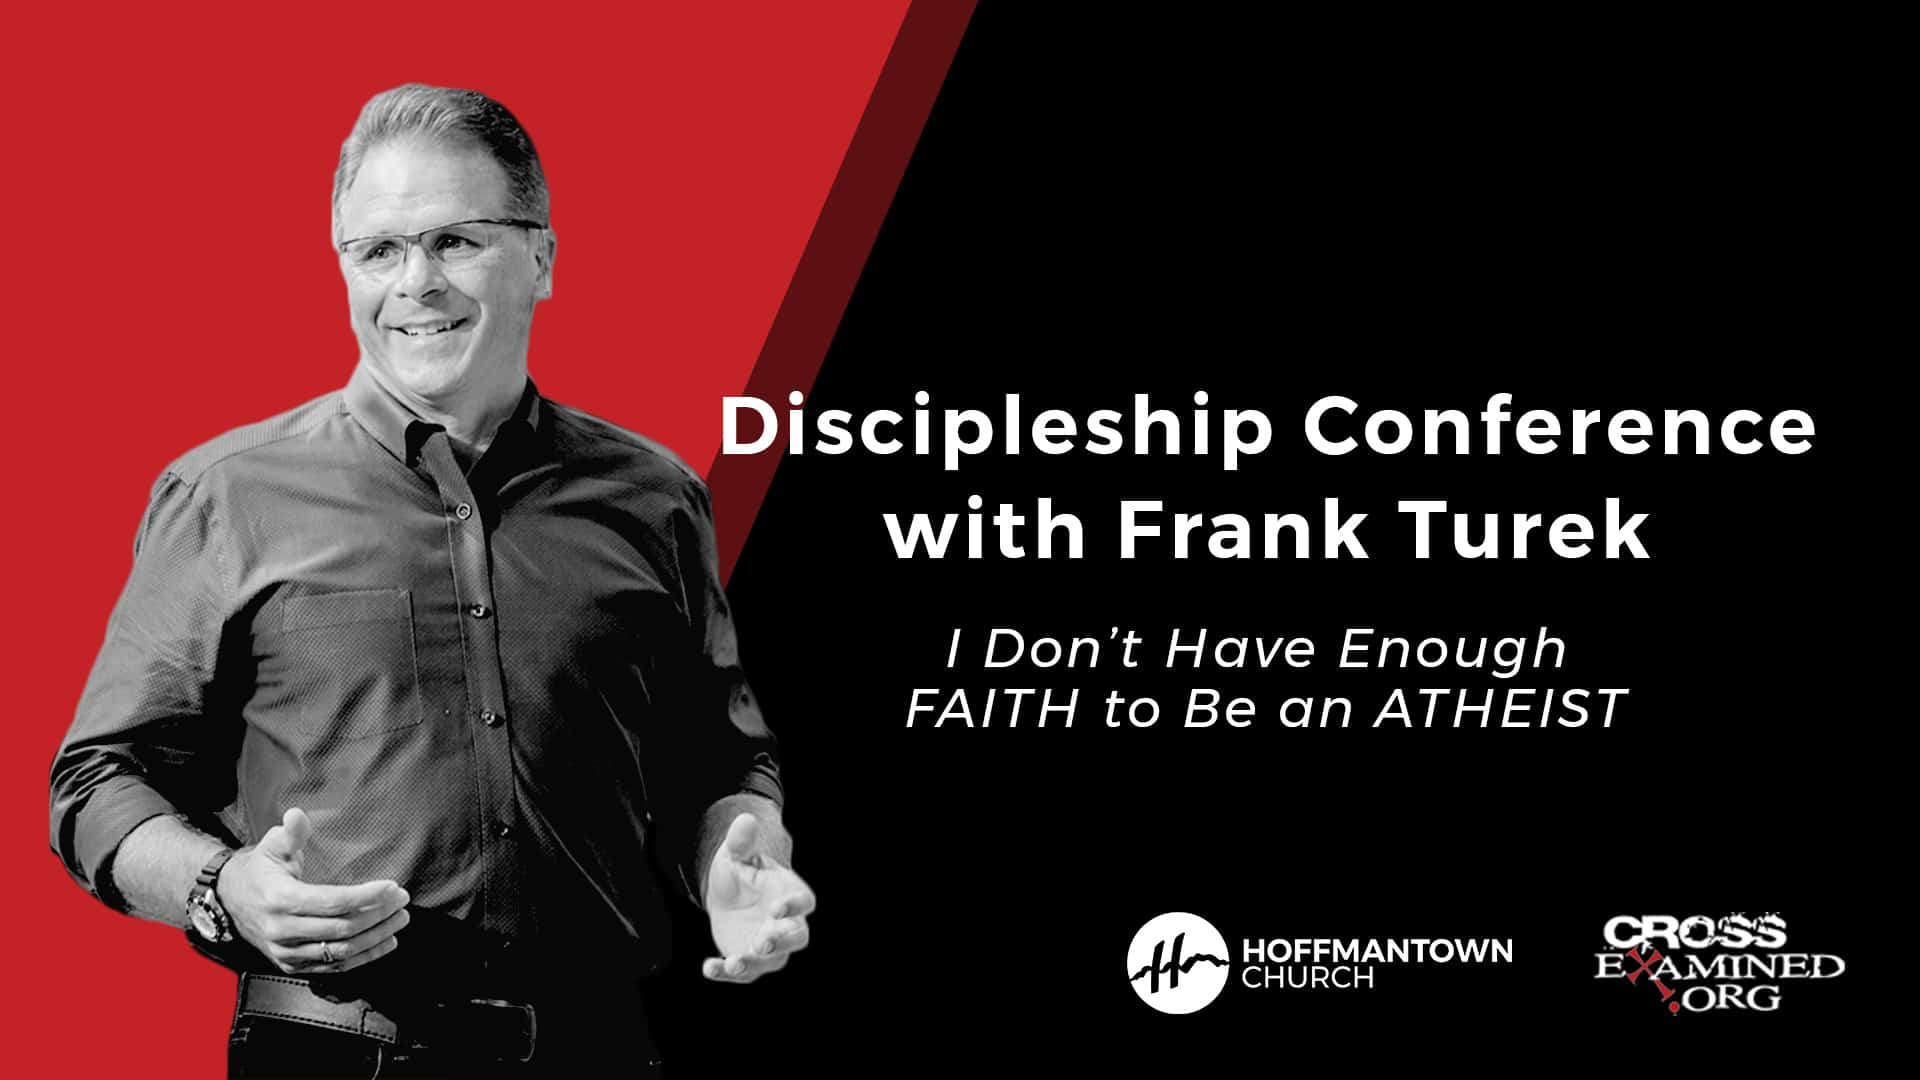 Frank-Turek-Discipleship-Conference-2020-16x9 copy